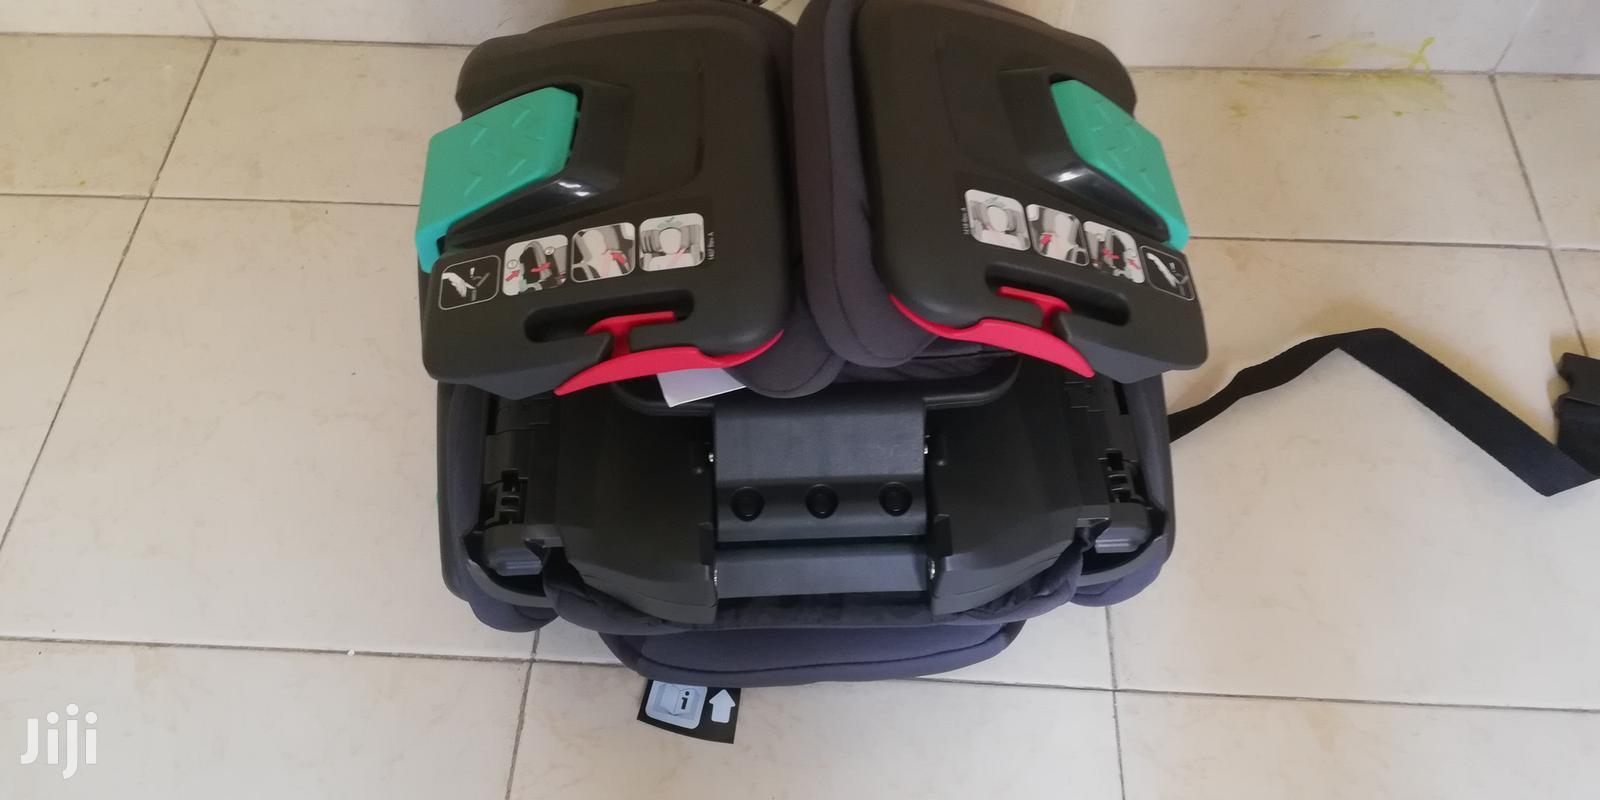 Hifold Child Booster Seat | Children's Gear & Safety for sale in Embakasi, Nairobi, Kenya